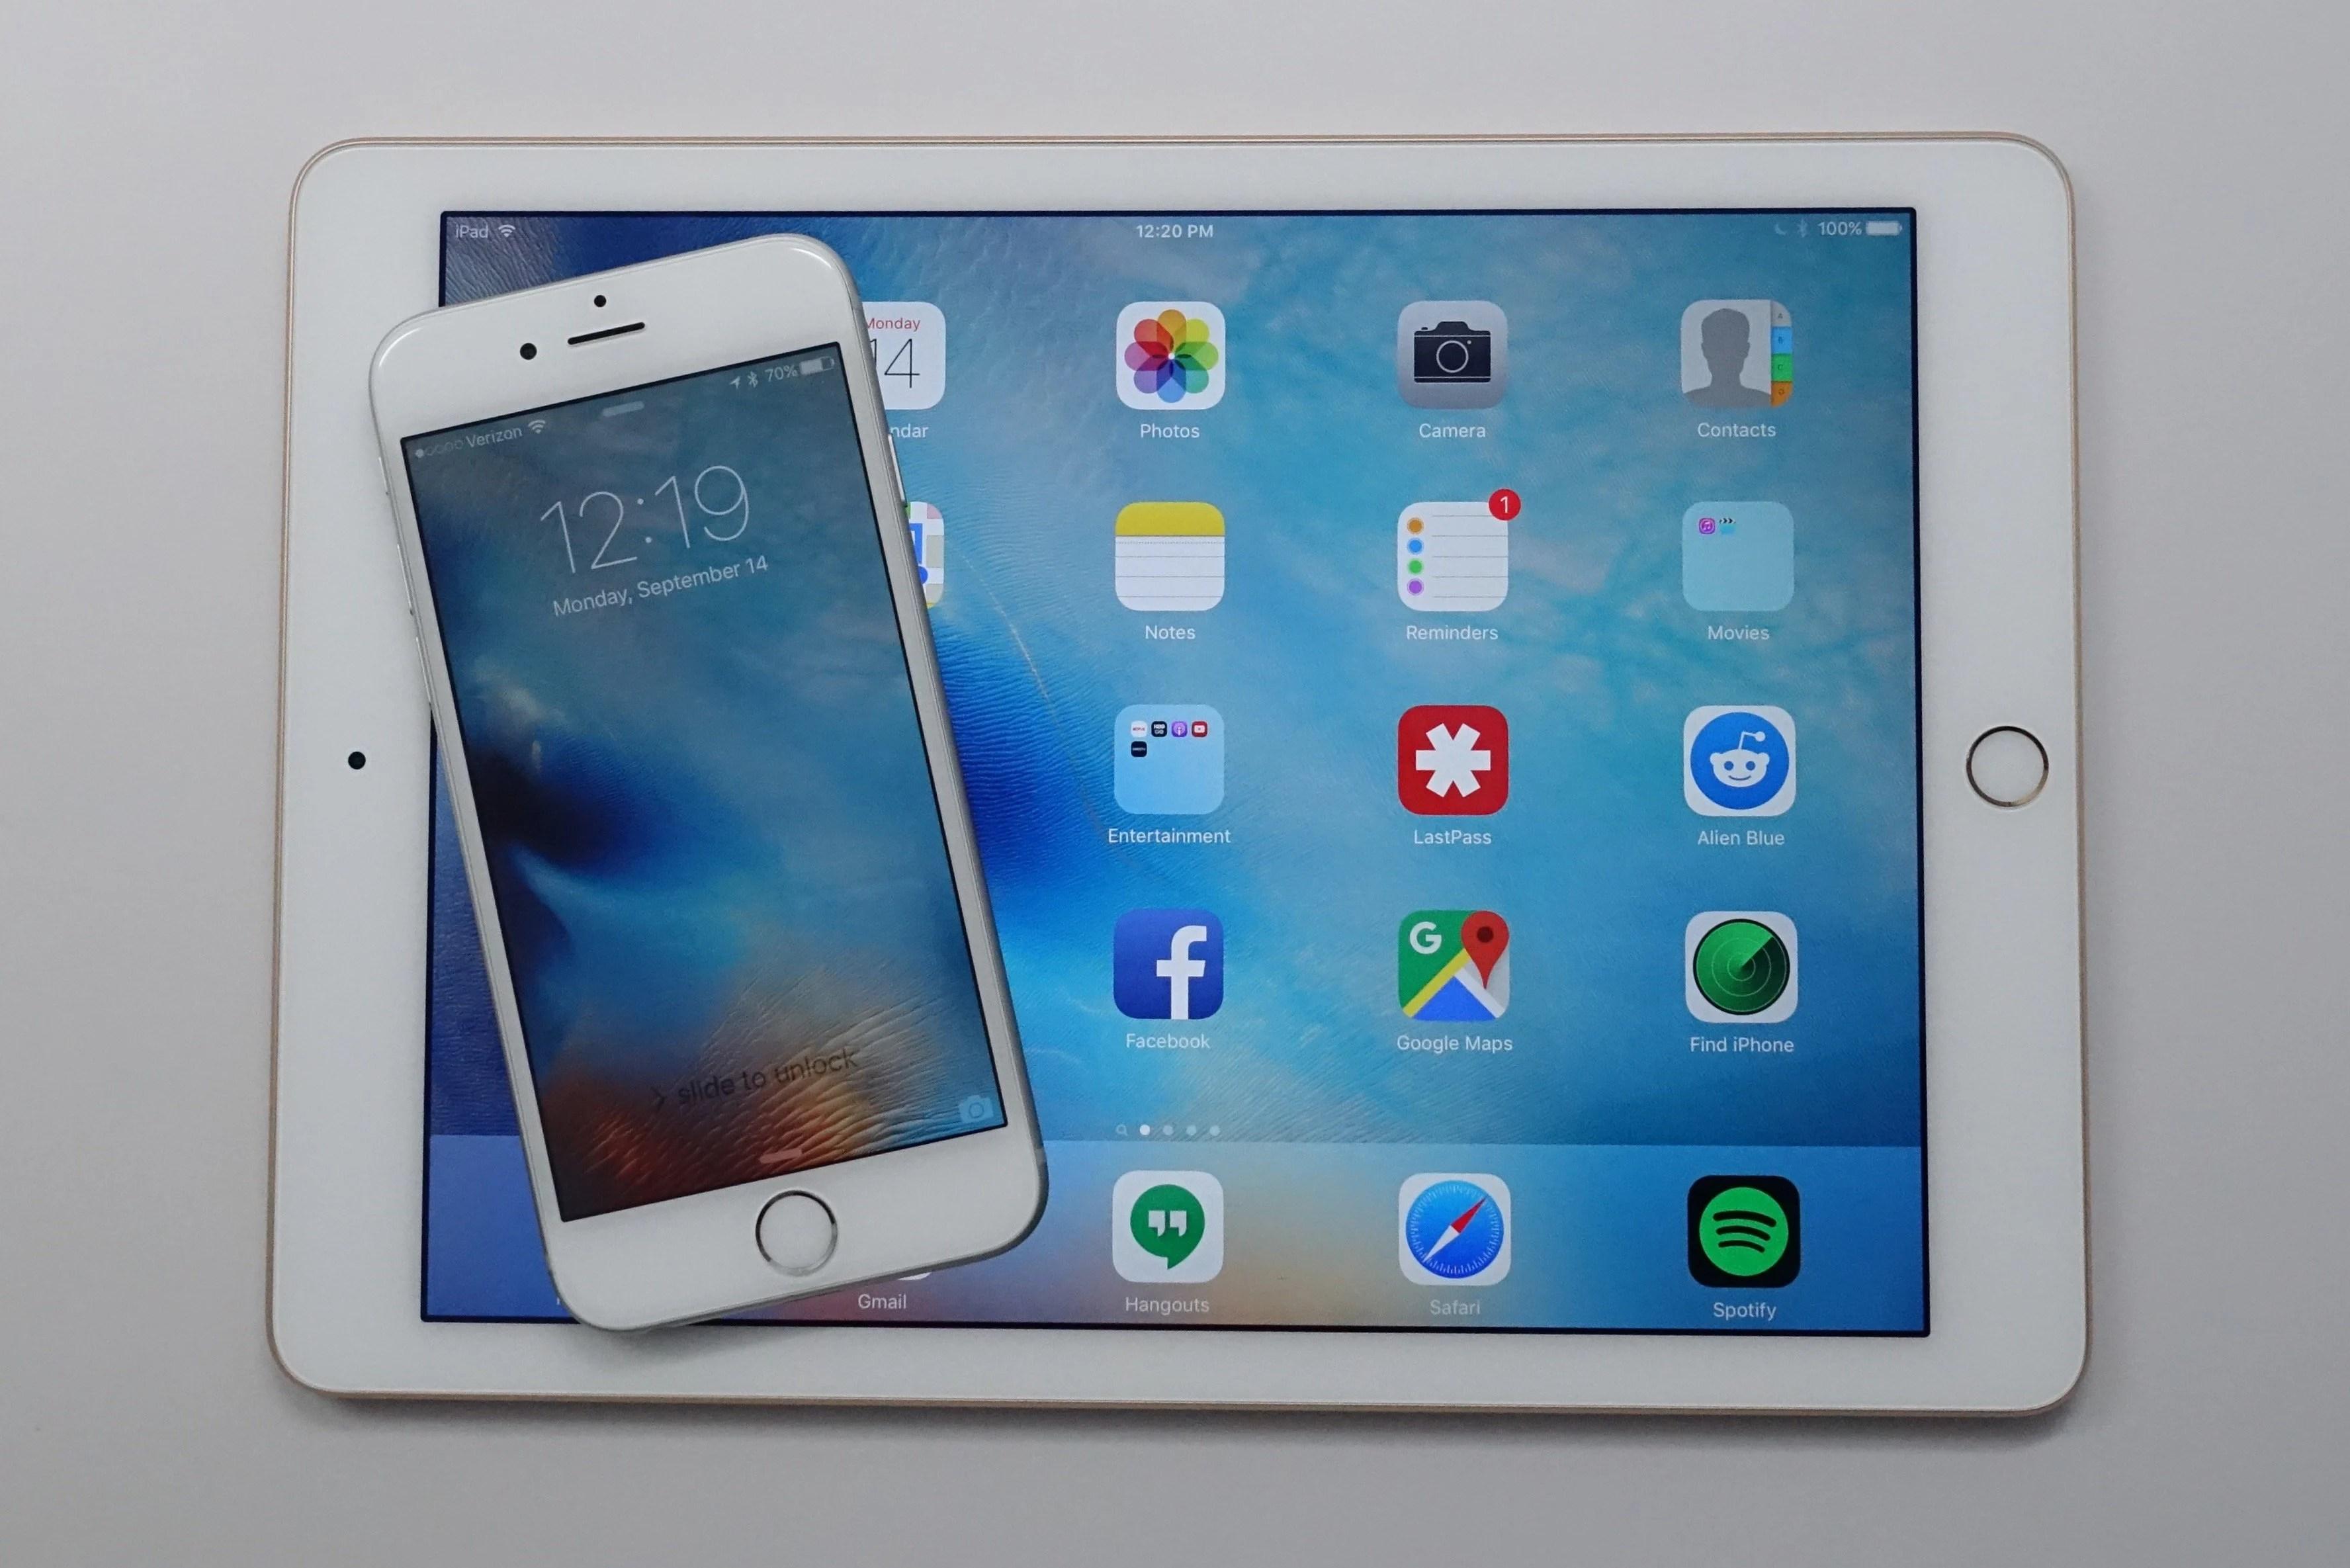 iOS 9 on iPad: First Impressions & Performance